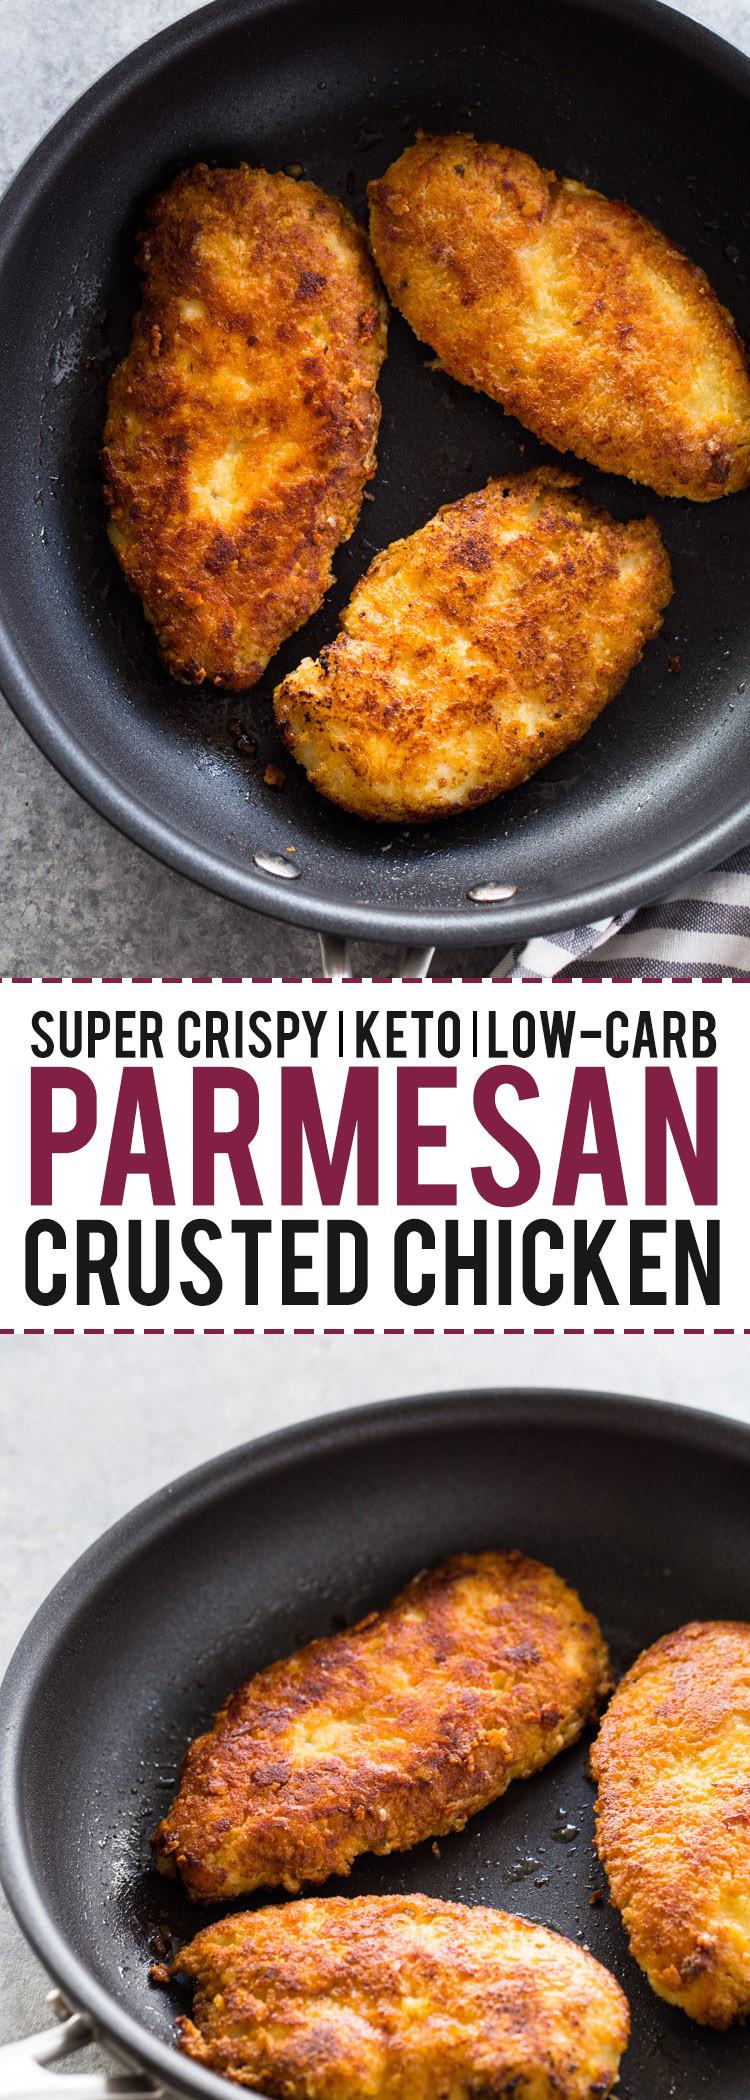 Parmesan Crusted Chicken Air Fryer Keto  Keto parmesan crusted chicken in air fryer Air Fryer